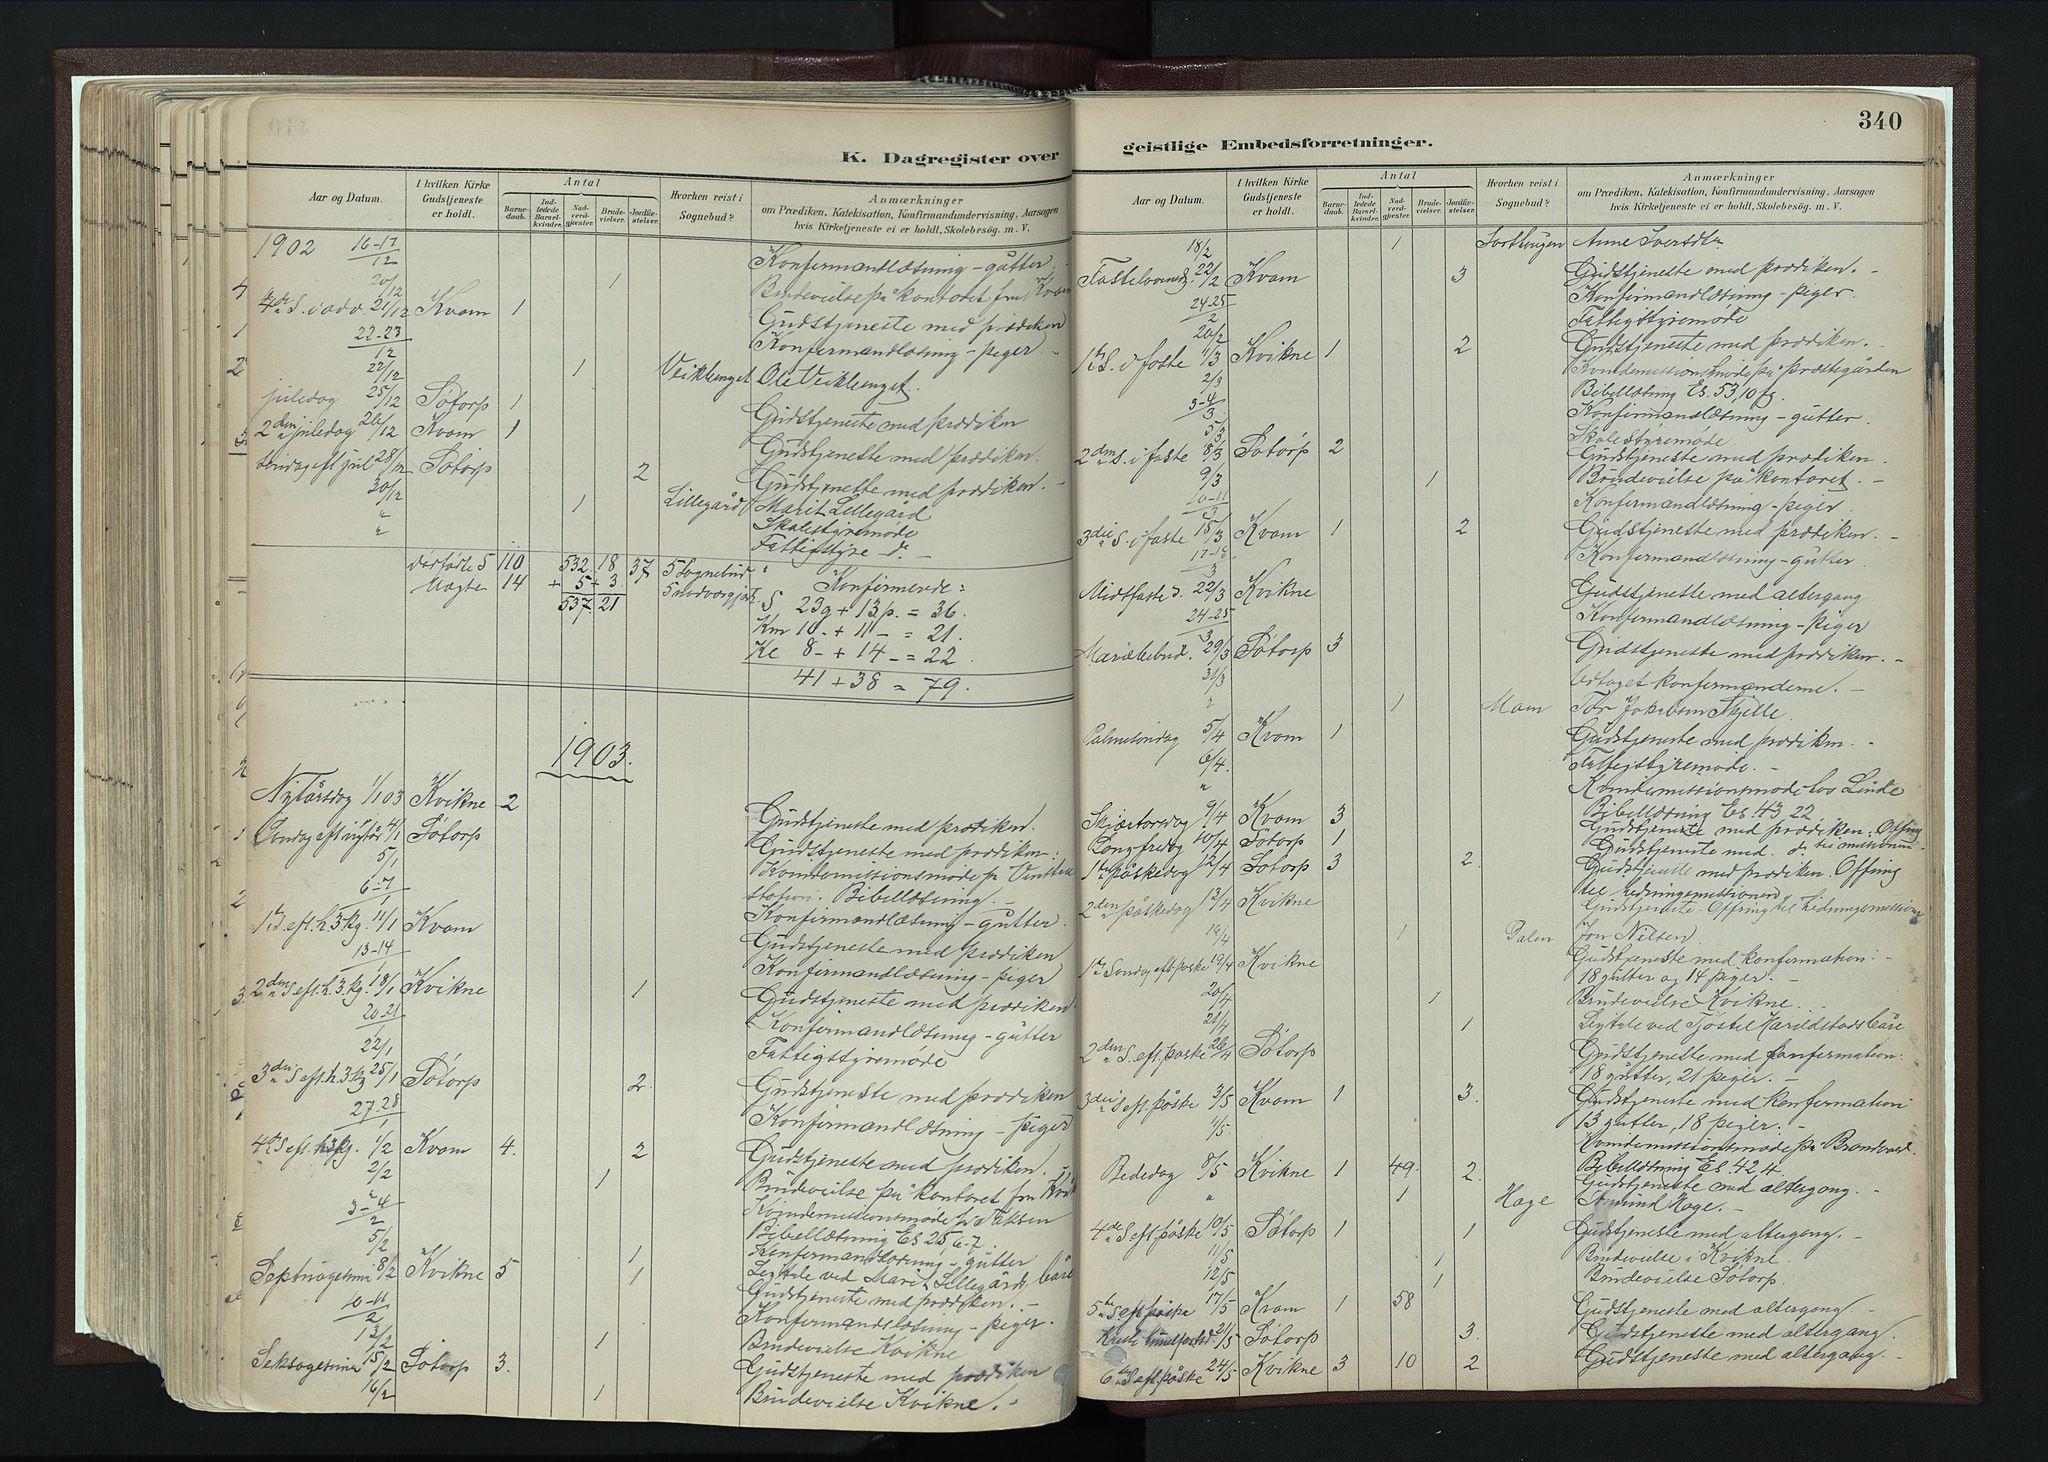 SAH, Nord-Fron prestekontor, Ministerialbok nr. 4, 1884-1914, s. 340